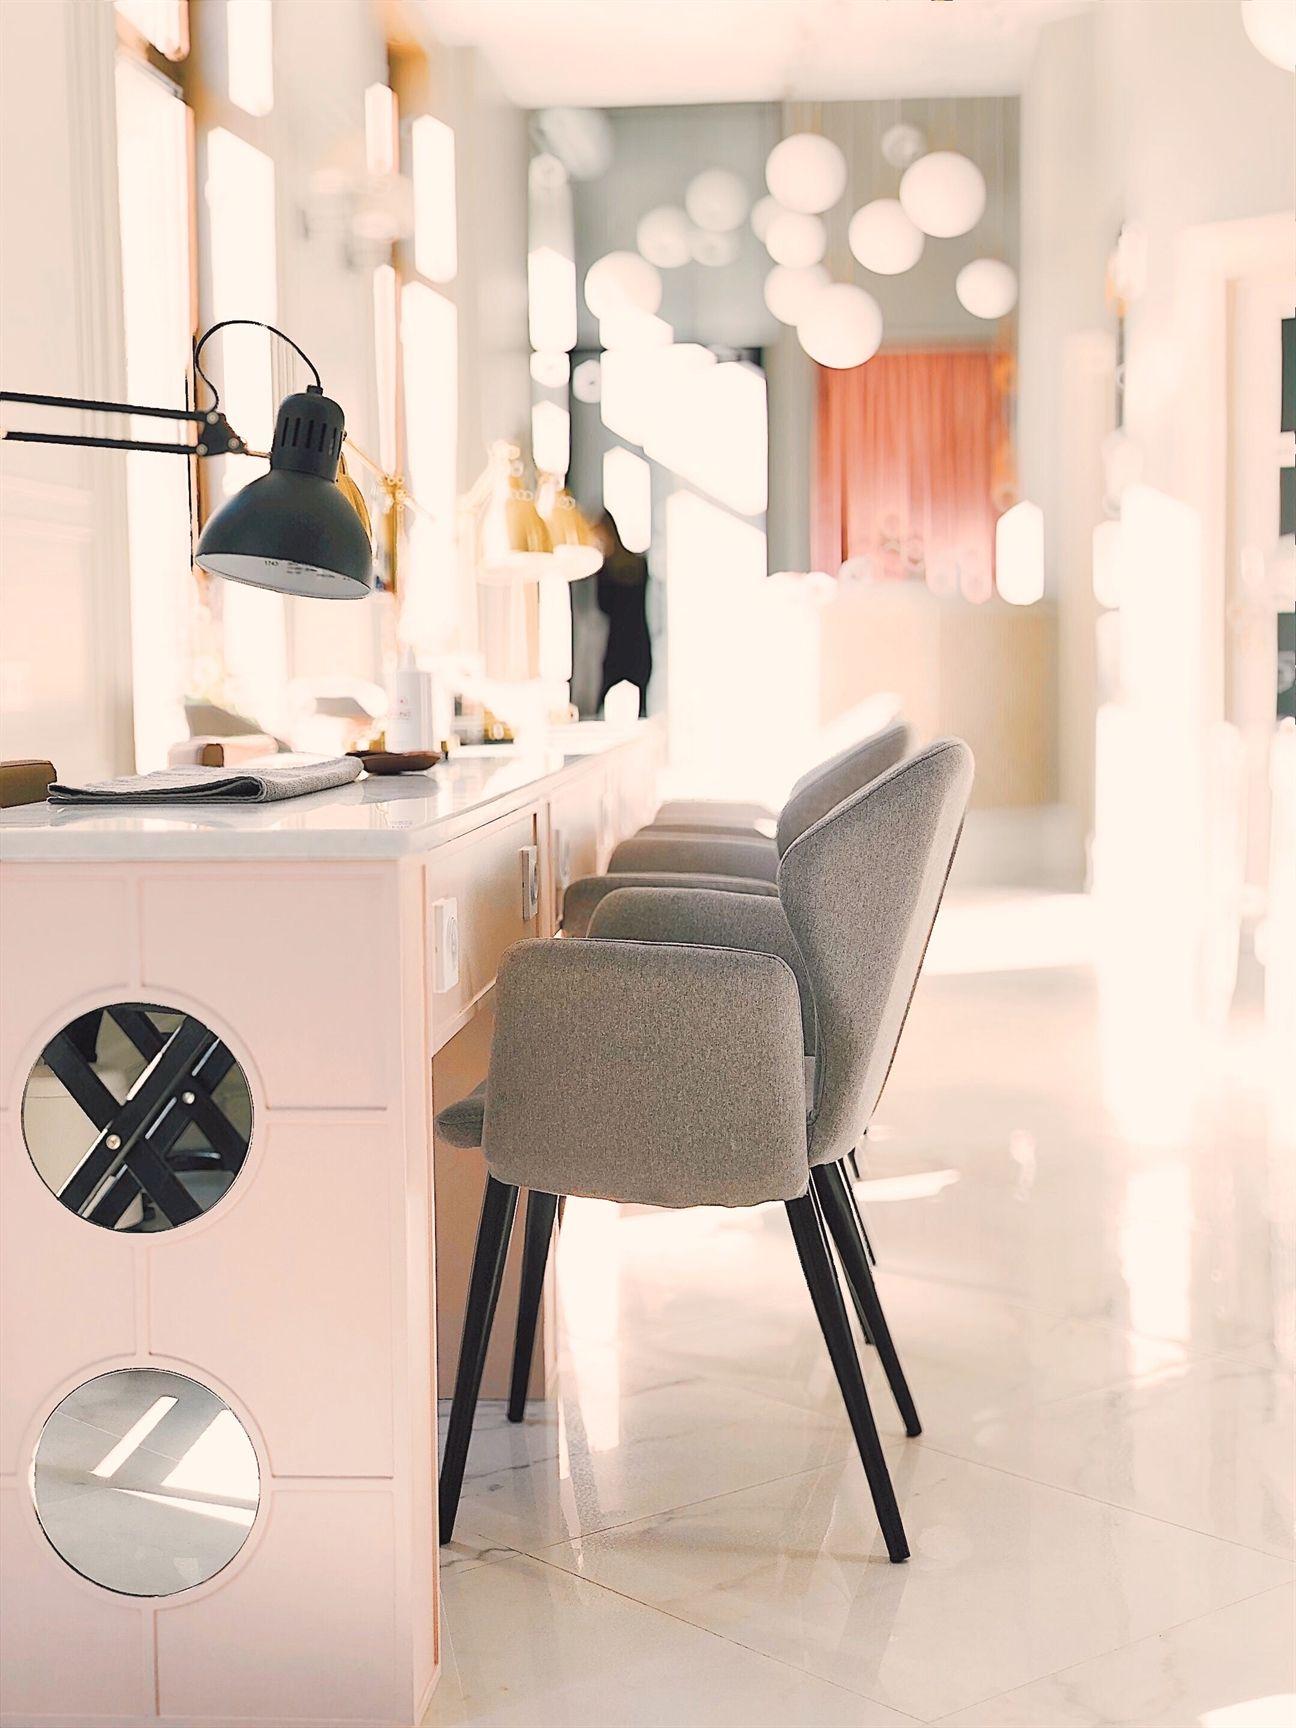 Home Decor Trade 842 20181225194914 62 S Paris Country Cottage Catalogs